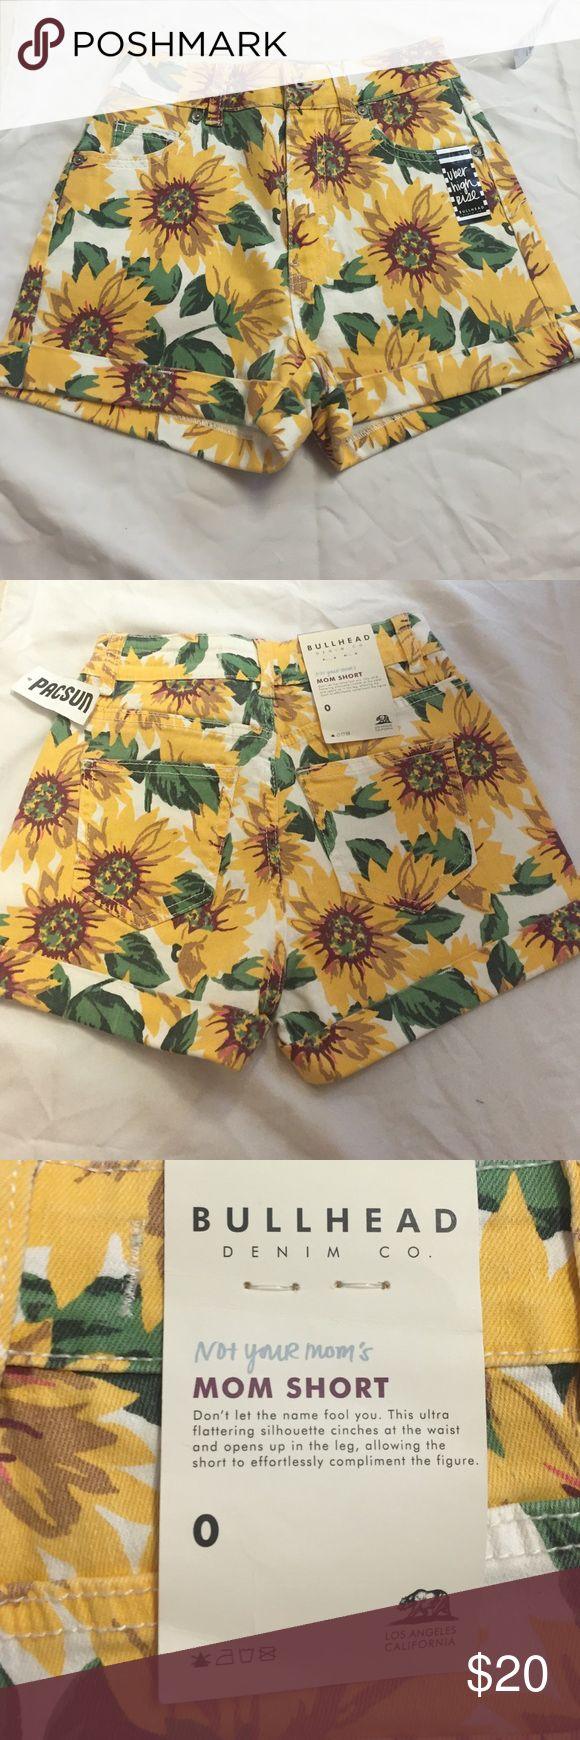 Pacsun Daisy shorts Pacsun Bullhead Denim Co. uber high rise mom shorts. Size 0. New with tags. Bullhead Shorts Jean Shorts